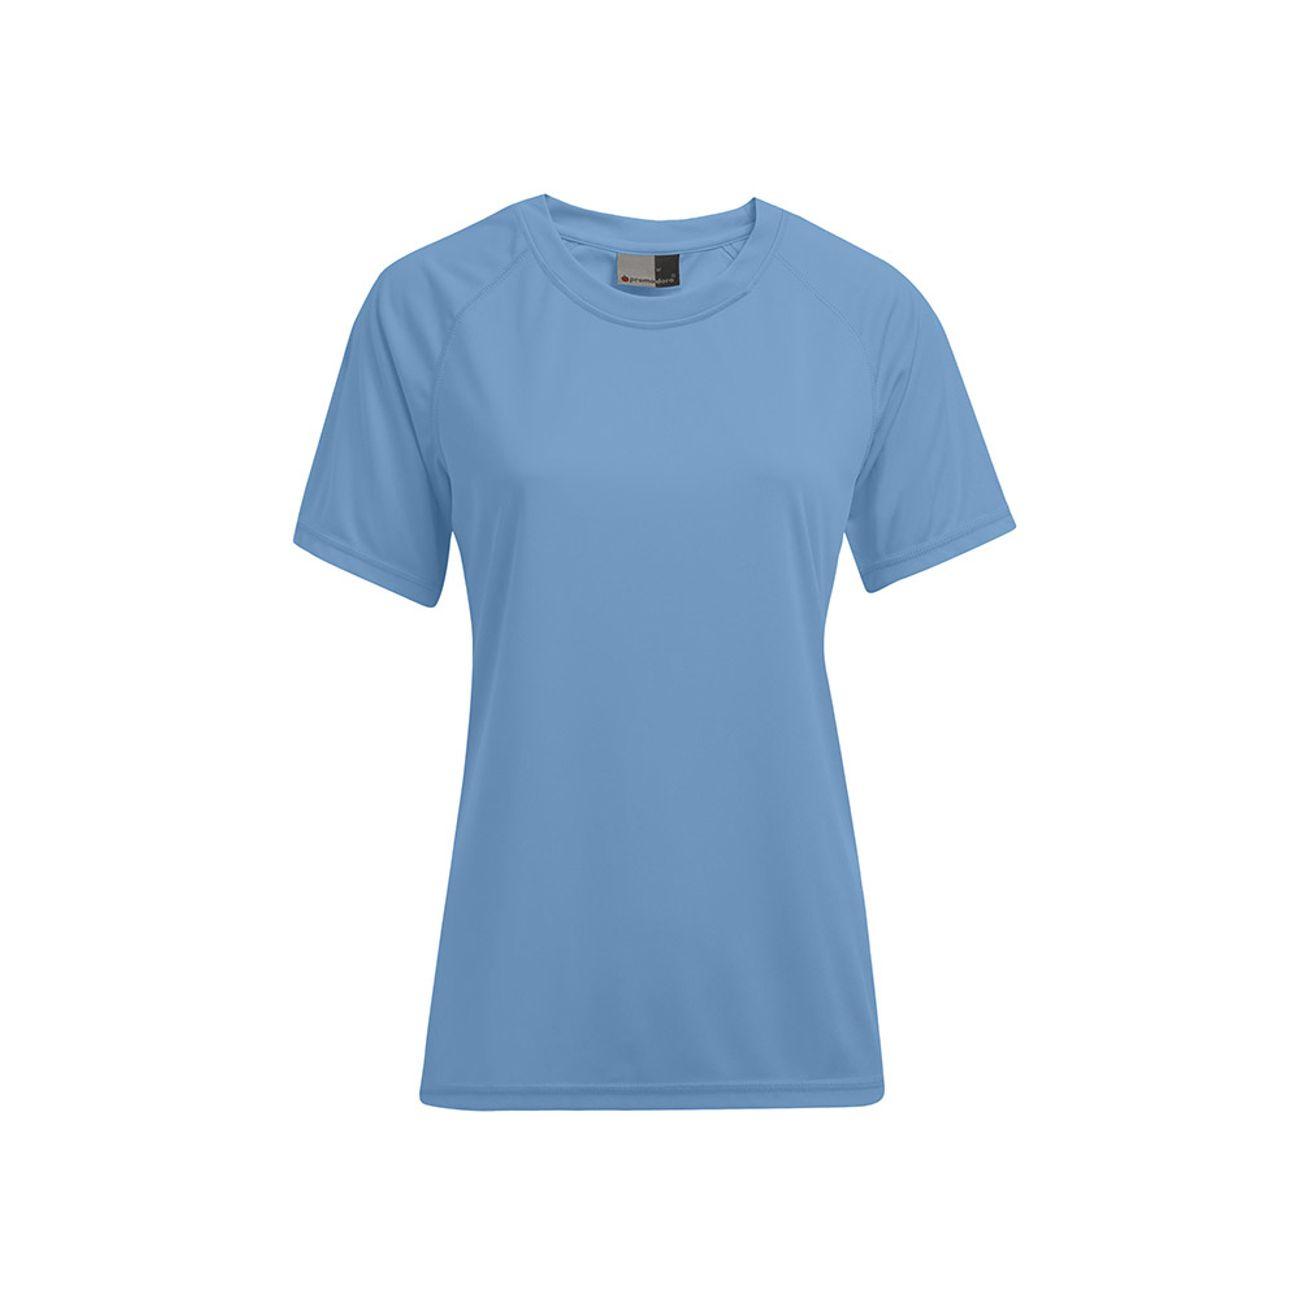 reasonable price closer at size 40 Randonnée pédestre femme PROMODORO T-shirt sport femme grande taille